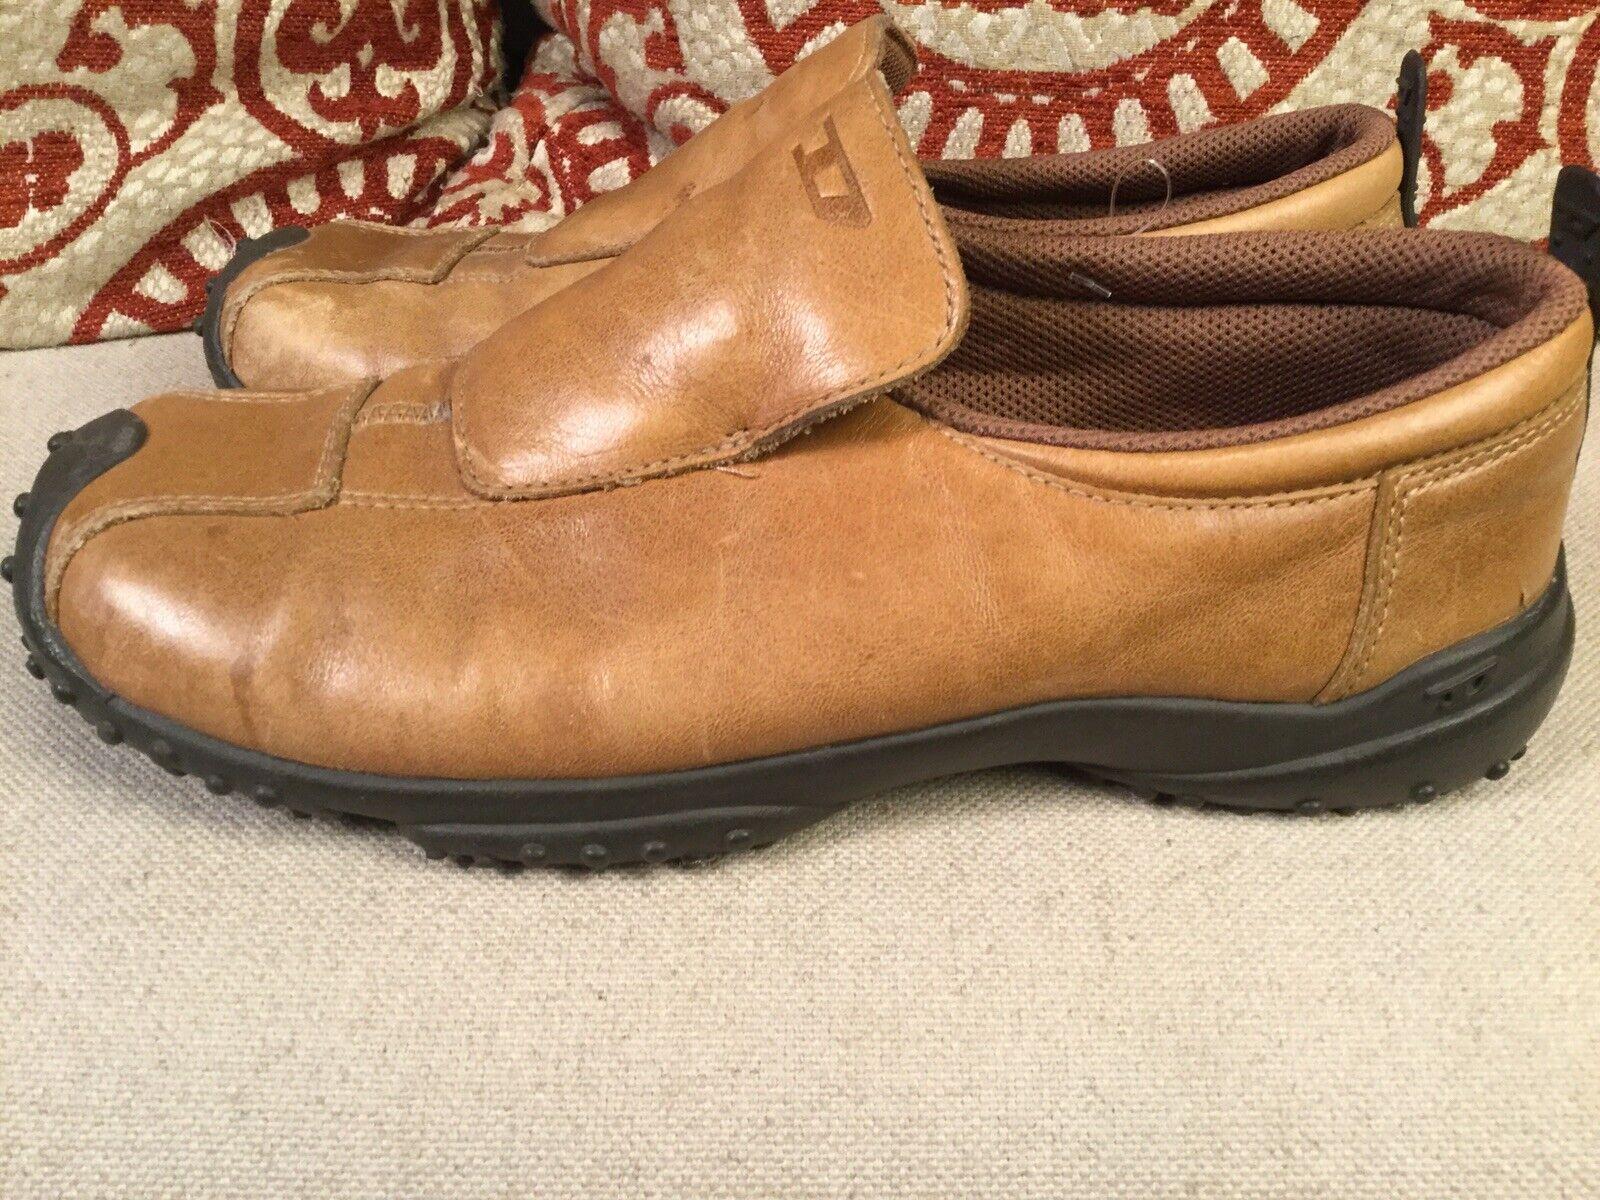 Diesel Ovado Men Leather Brown Slip On Fashion Sneaker Casual Dress shoes 8M